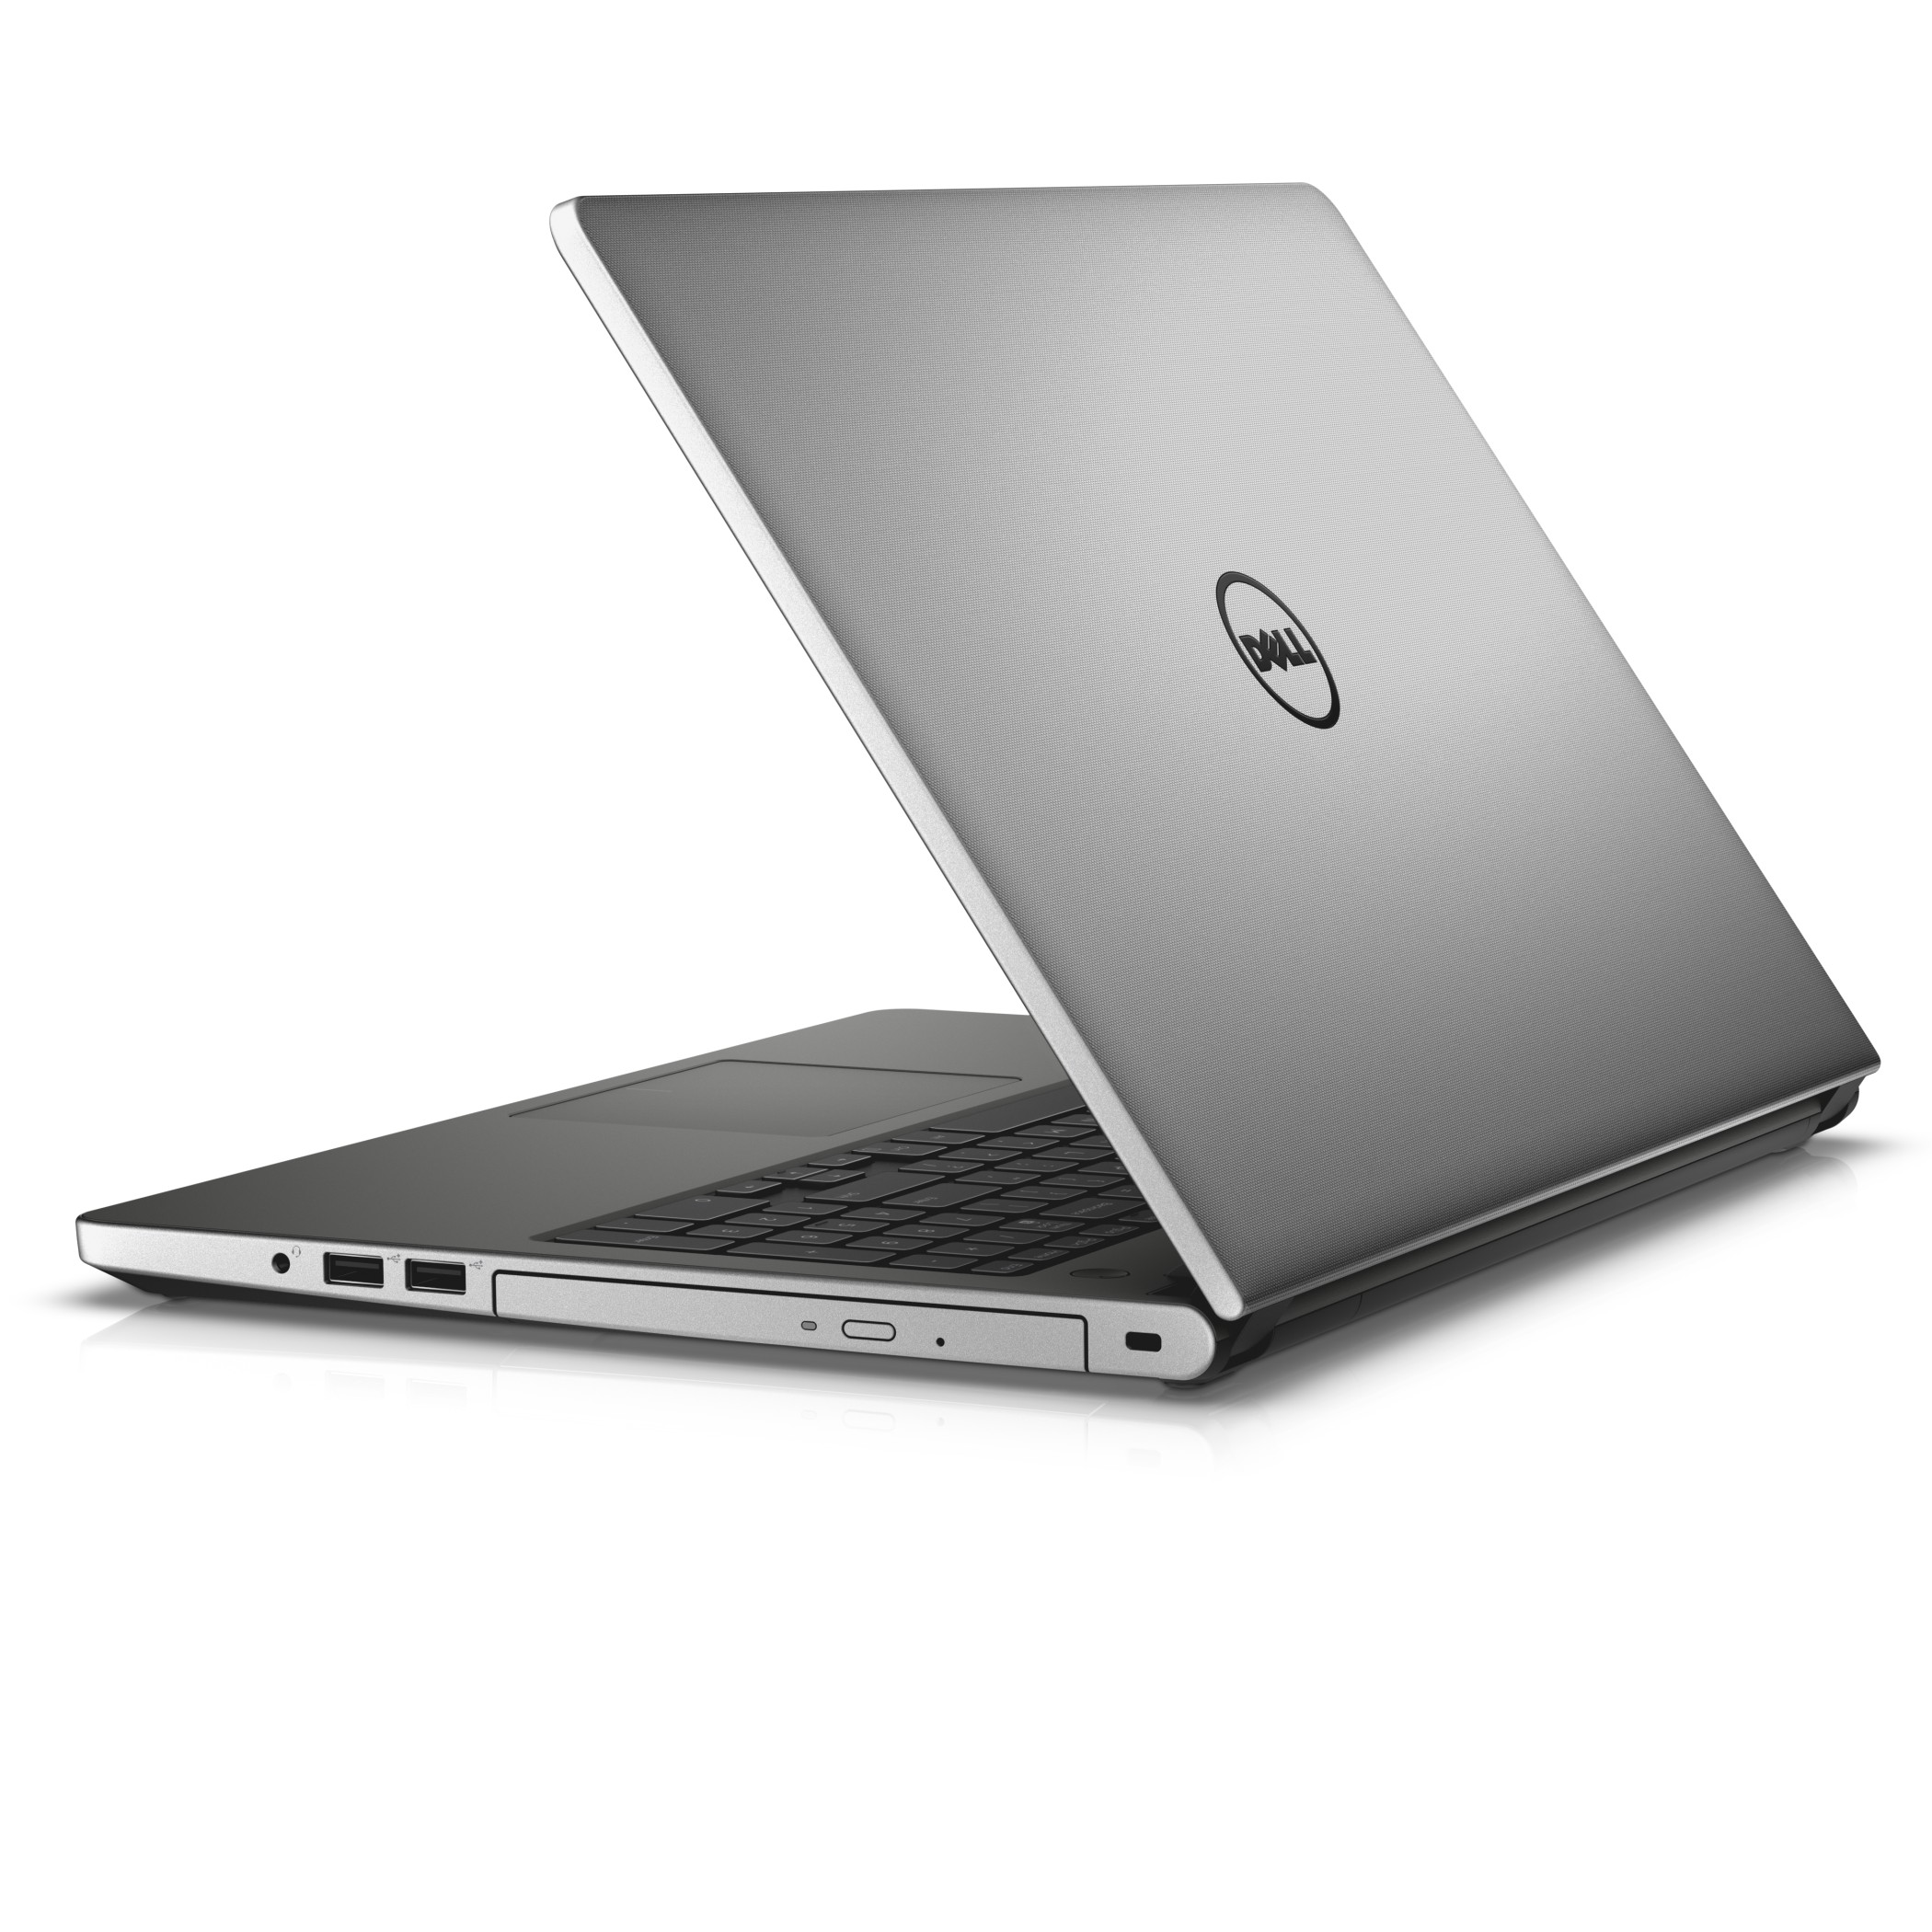 "Dell Inspiron 5559 15"" i5-6200U/4GB/500GB/M335-2G/HDMI/RJ45/WIFI/BT/MCR/W10UPG/2NBD stříbrný"